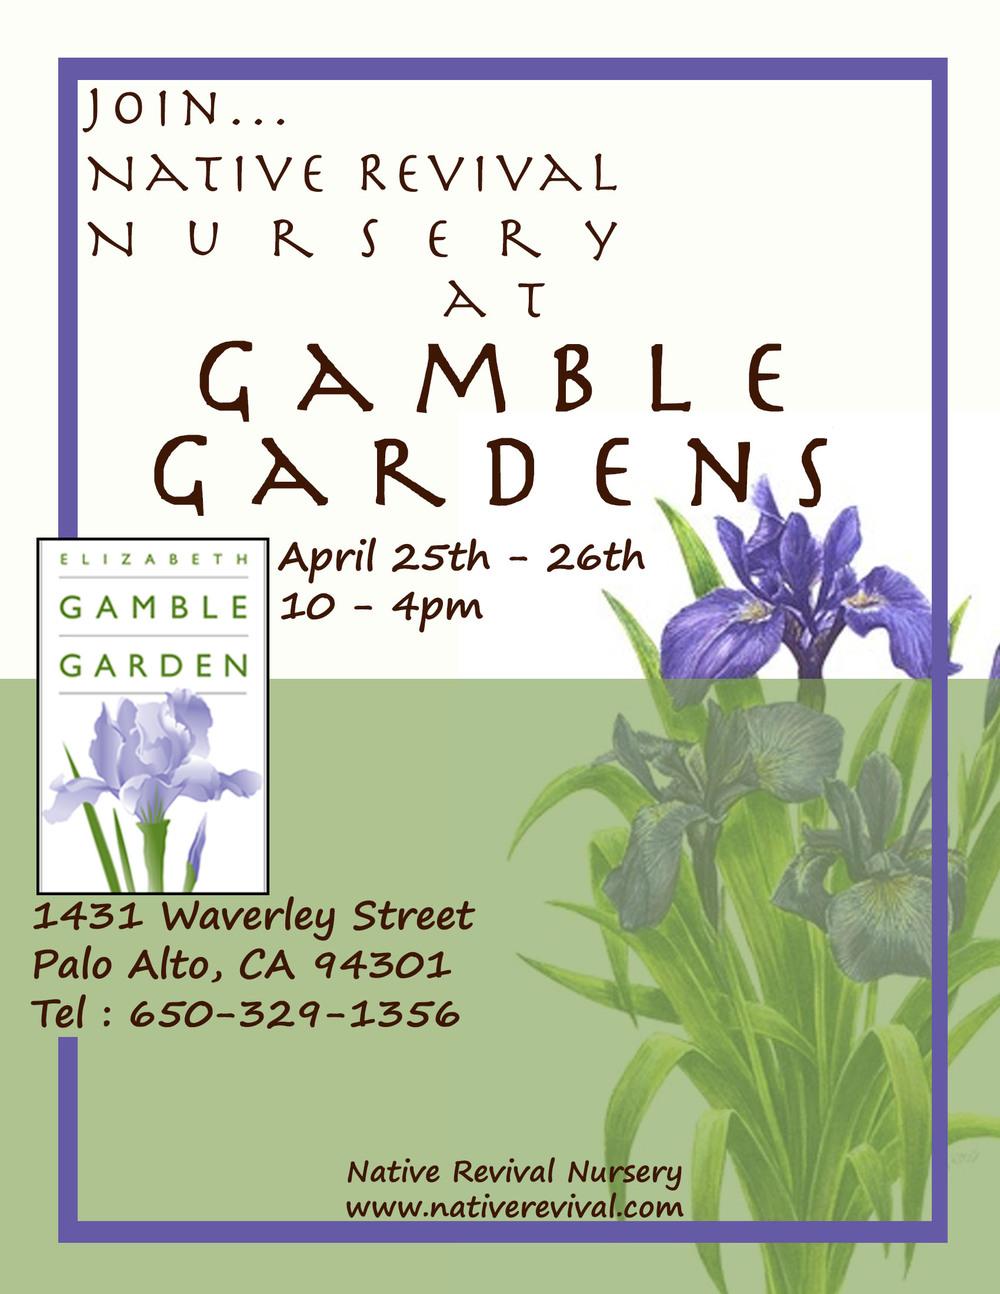 Gamble Gardens Flyer1.jpg